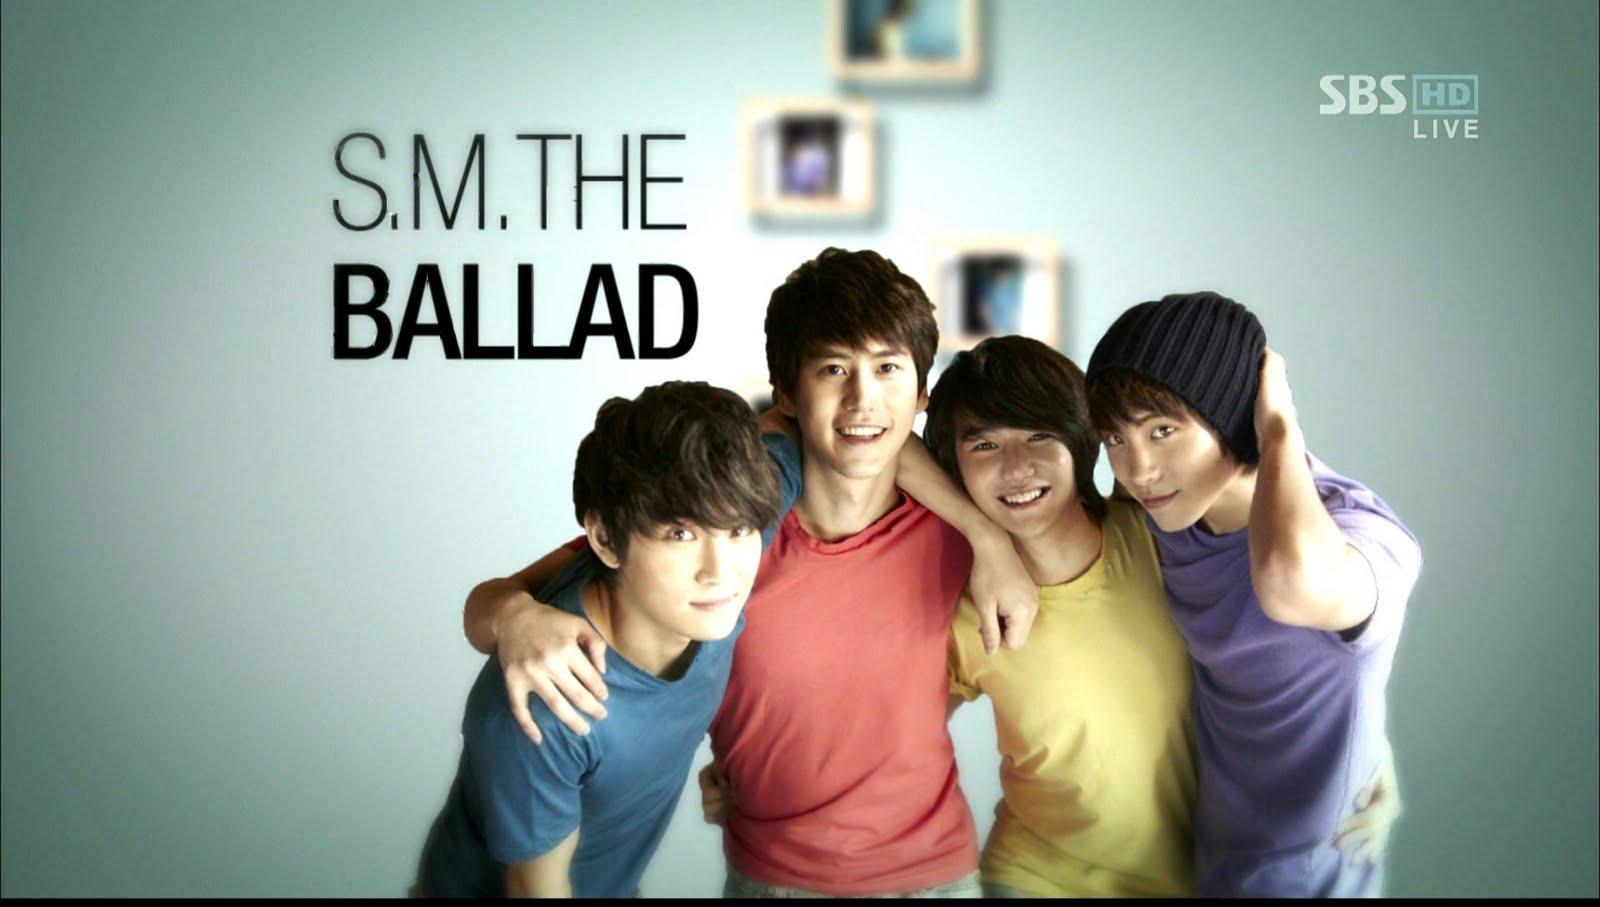 http://2.bp.blogspot.com/_acuEWdYsv6o/TVCUzc_G1lI/AAAAAAAAFIg/DGep8aYq7gU/s1600/SM+The+Ballad.Miss+You.jpg